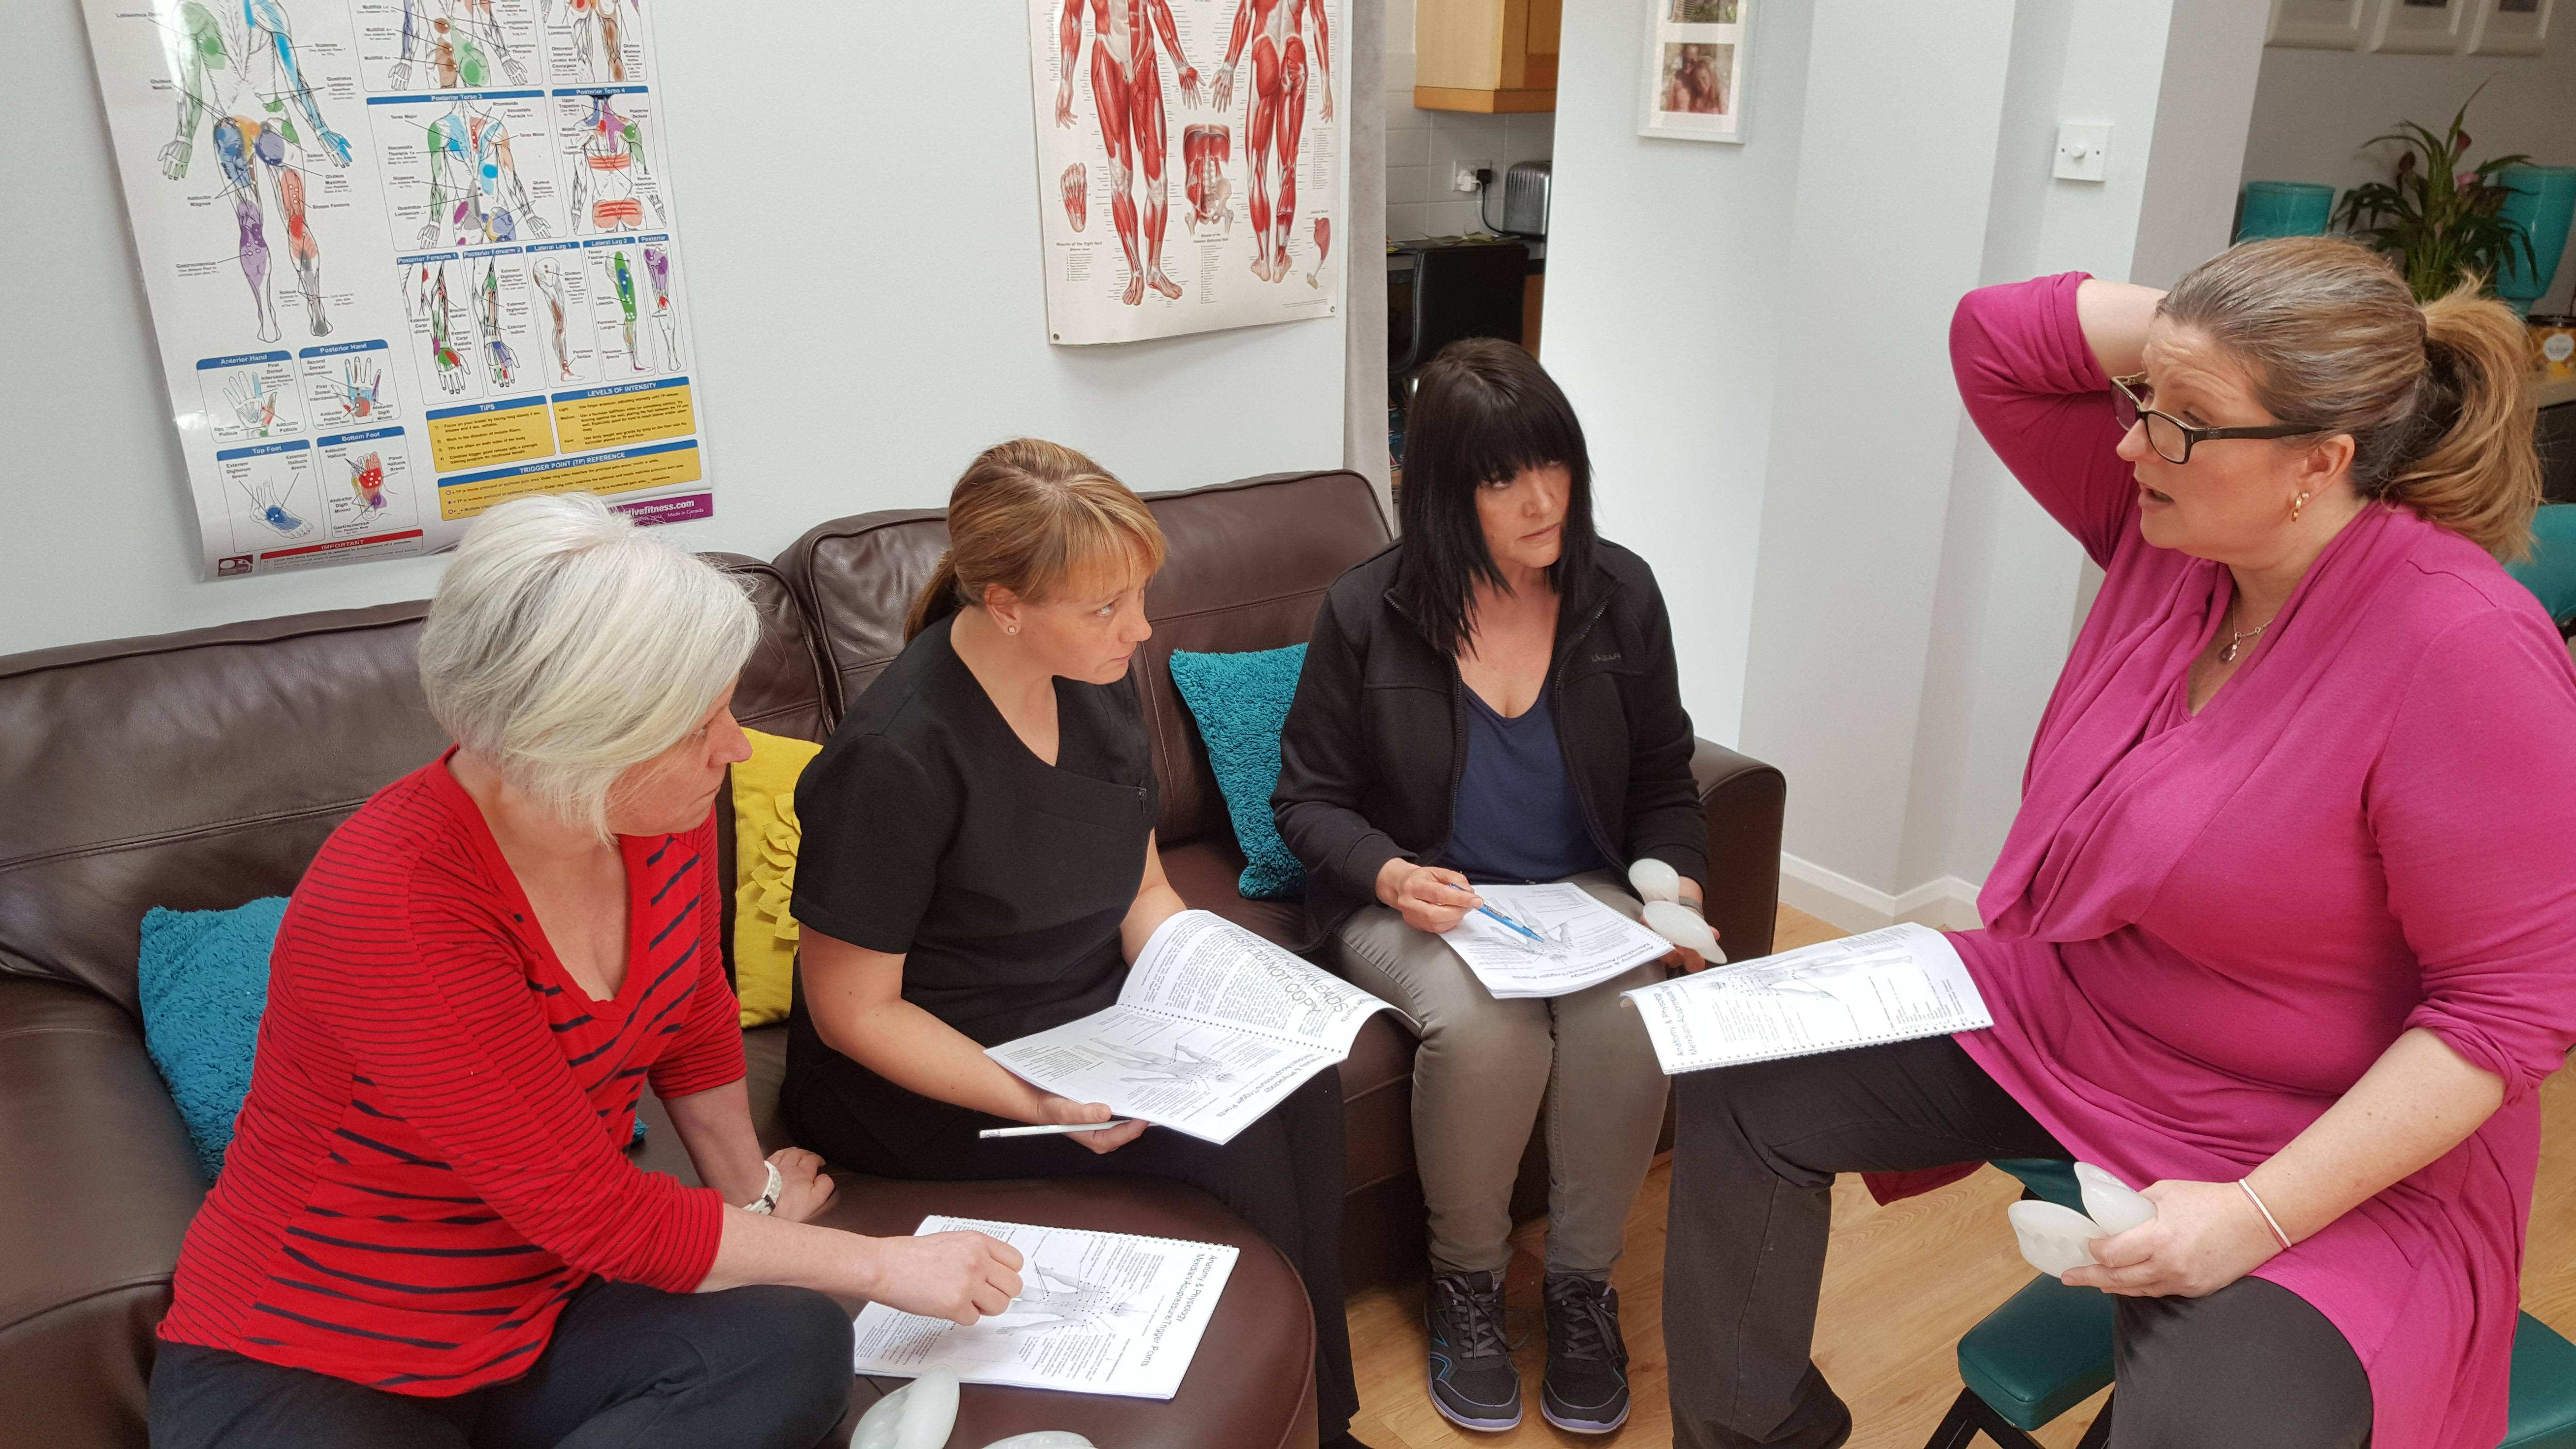 The Kneader designer Una Tucker in a training session